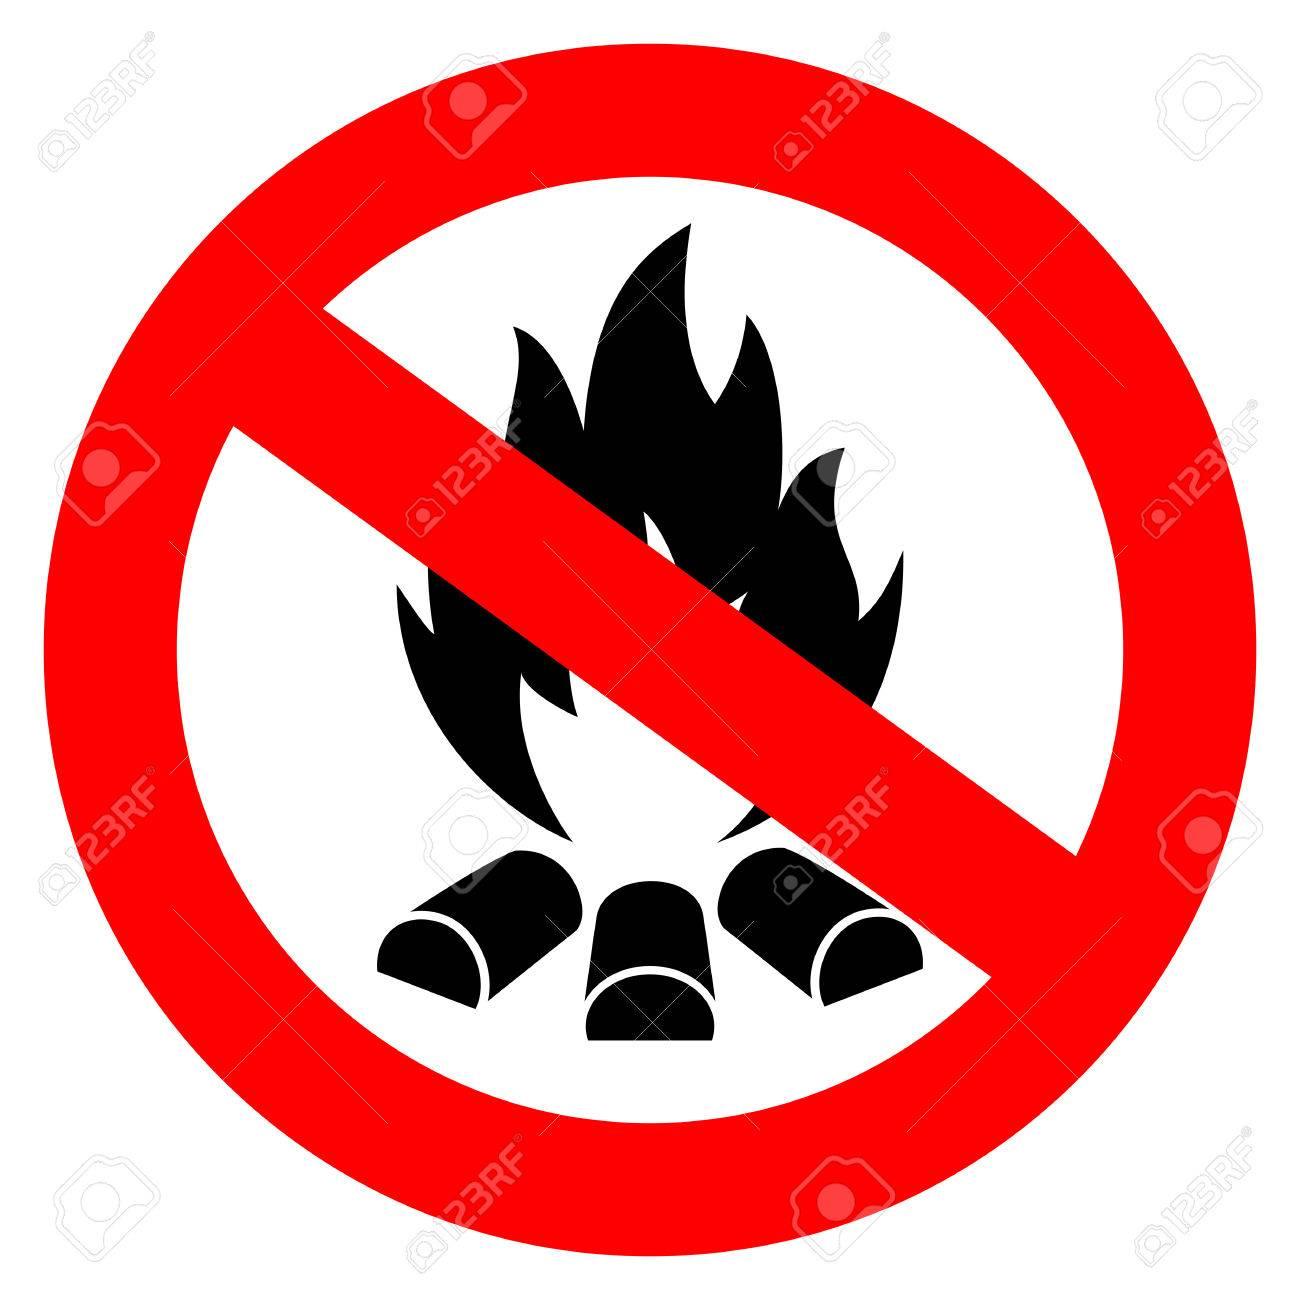 No open fire vector sign - 64138359